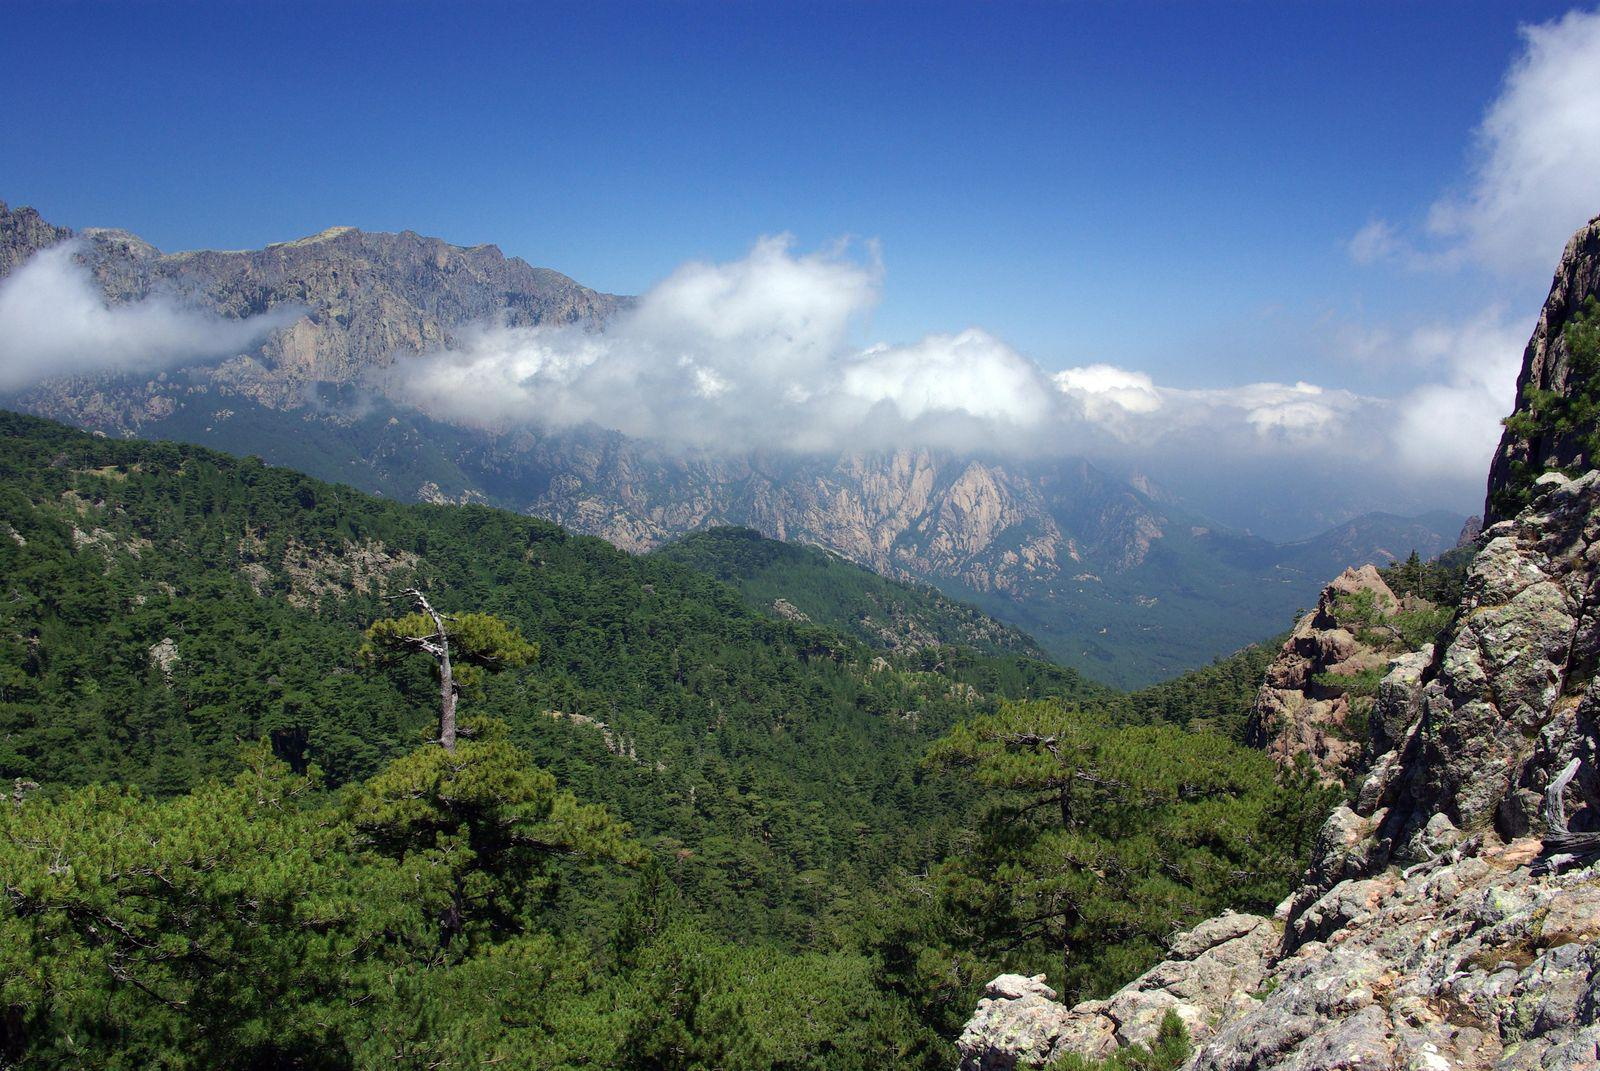 L'Alta Rocca 0 Aiguilles de Bavella à proximité de Zonza